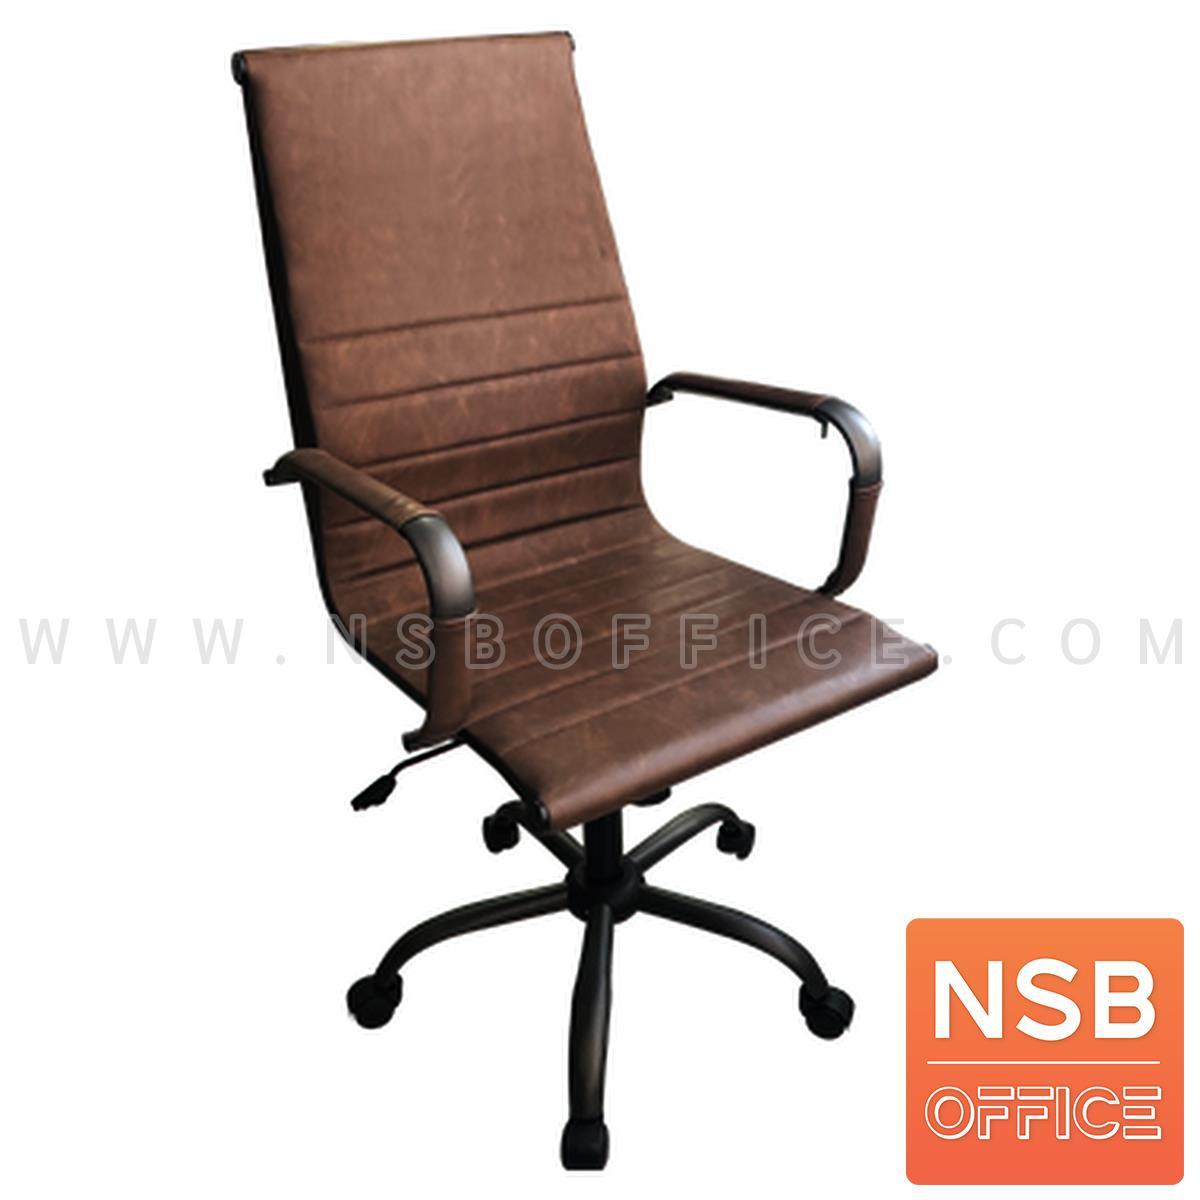 B01A531:เก้าอี้ผู้บริหาร รุ่น Lockdown (ล็อคดาวน์)  โช๊คแก๊ส ก้อนโยก ขาเหล็กชุบโครเมี่ยม